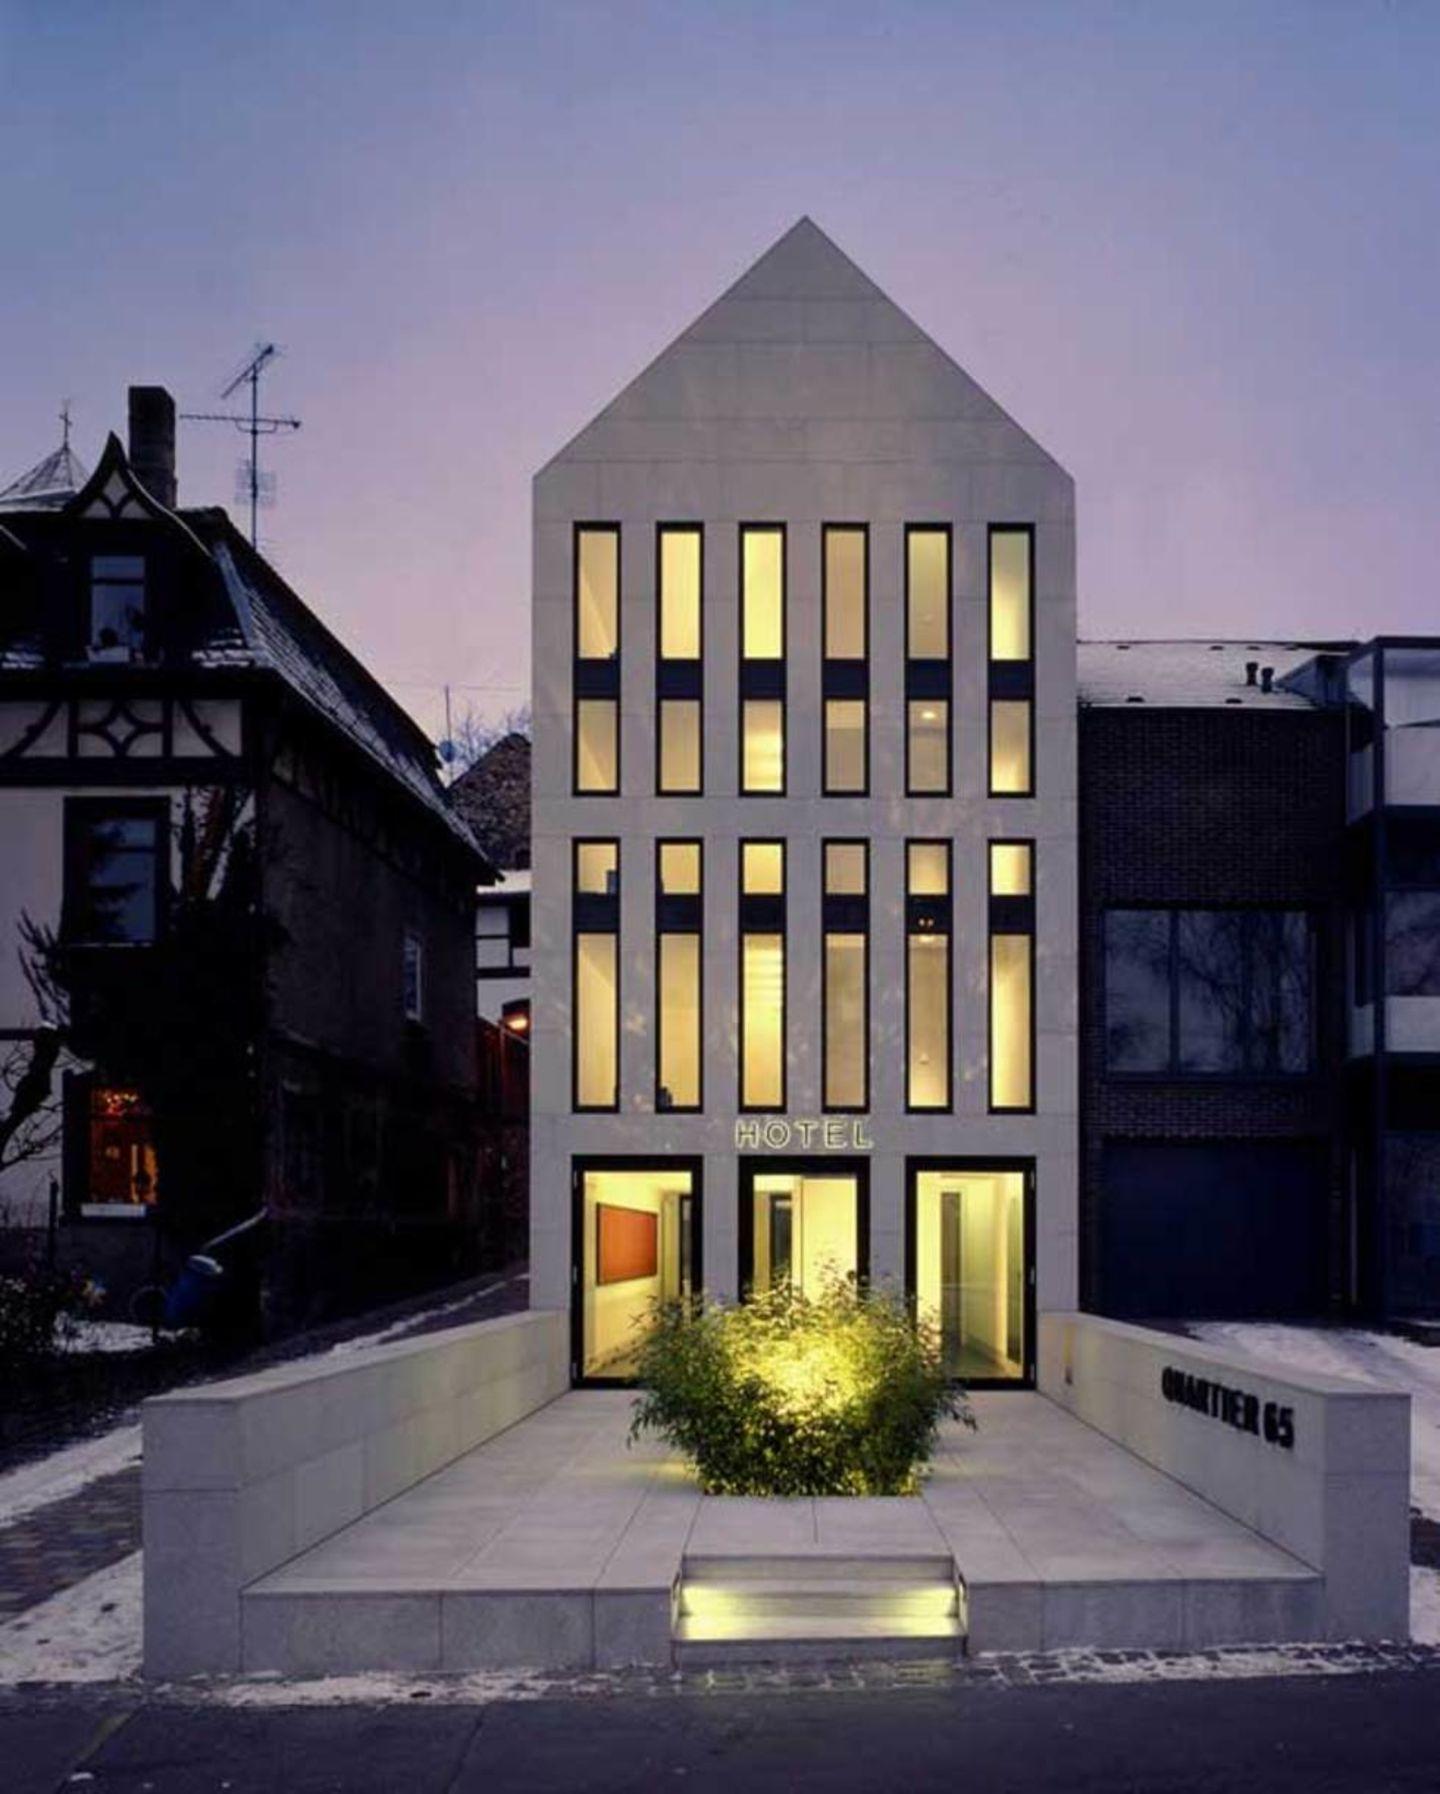 max dudler architekt hotel quartier 65 divisare hotels pinterest architekten fassaden. Black Bedroom Furniture Sets. Home Design Ideas